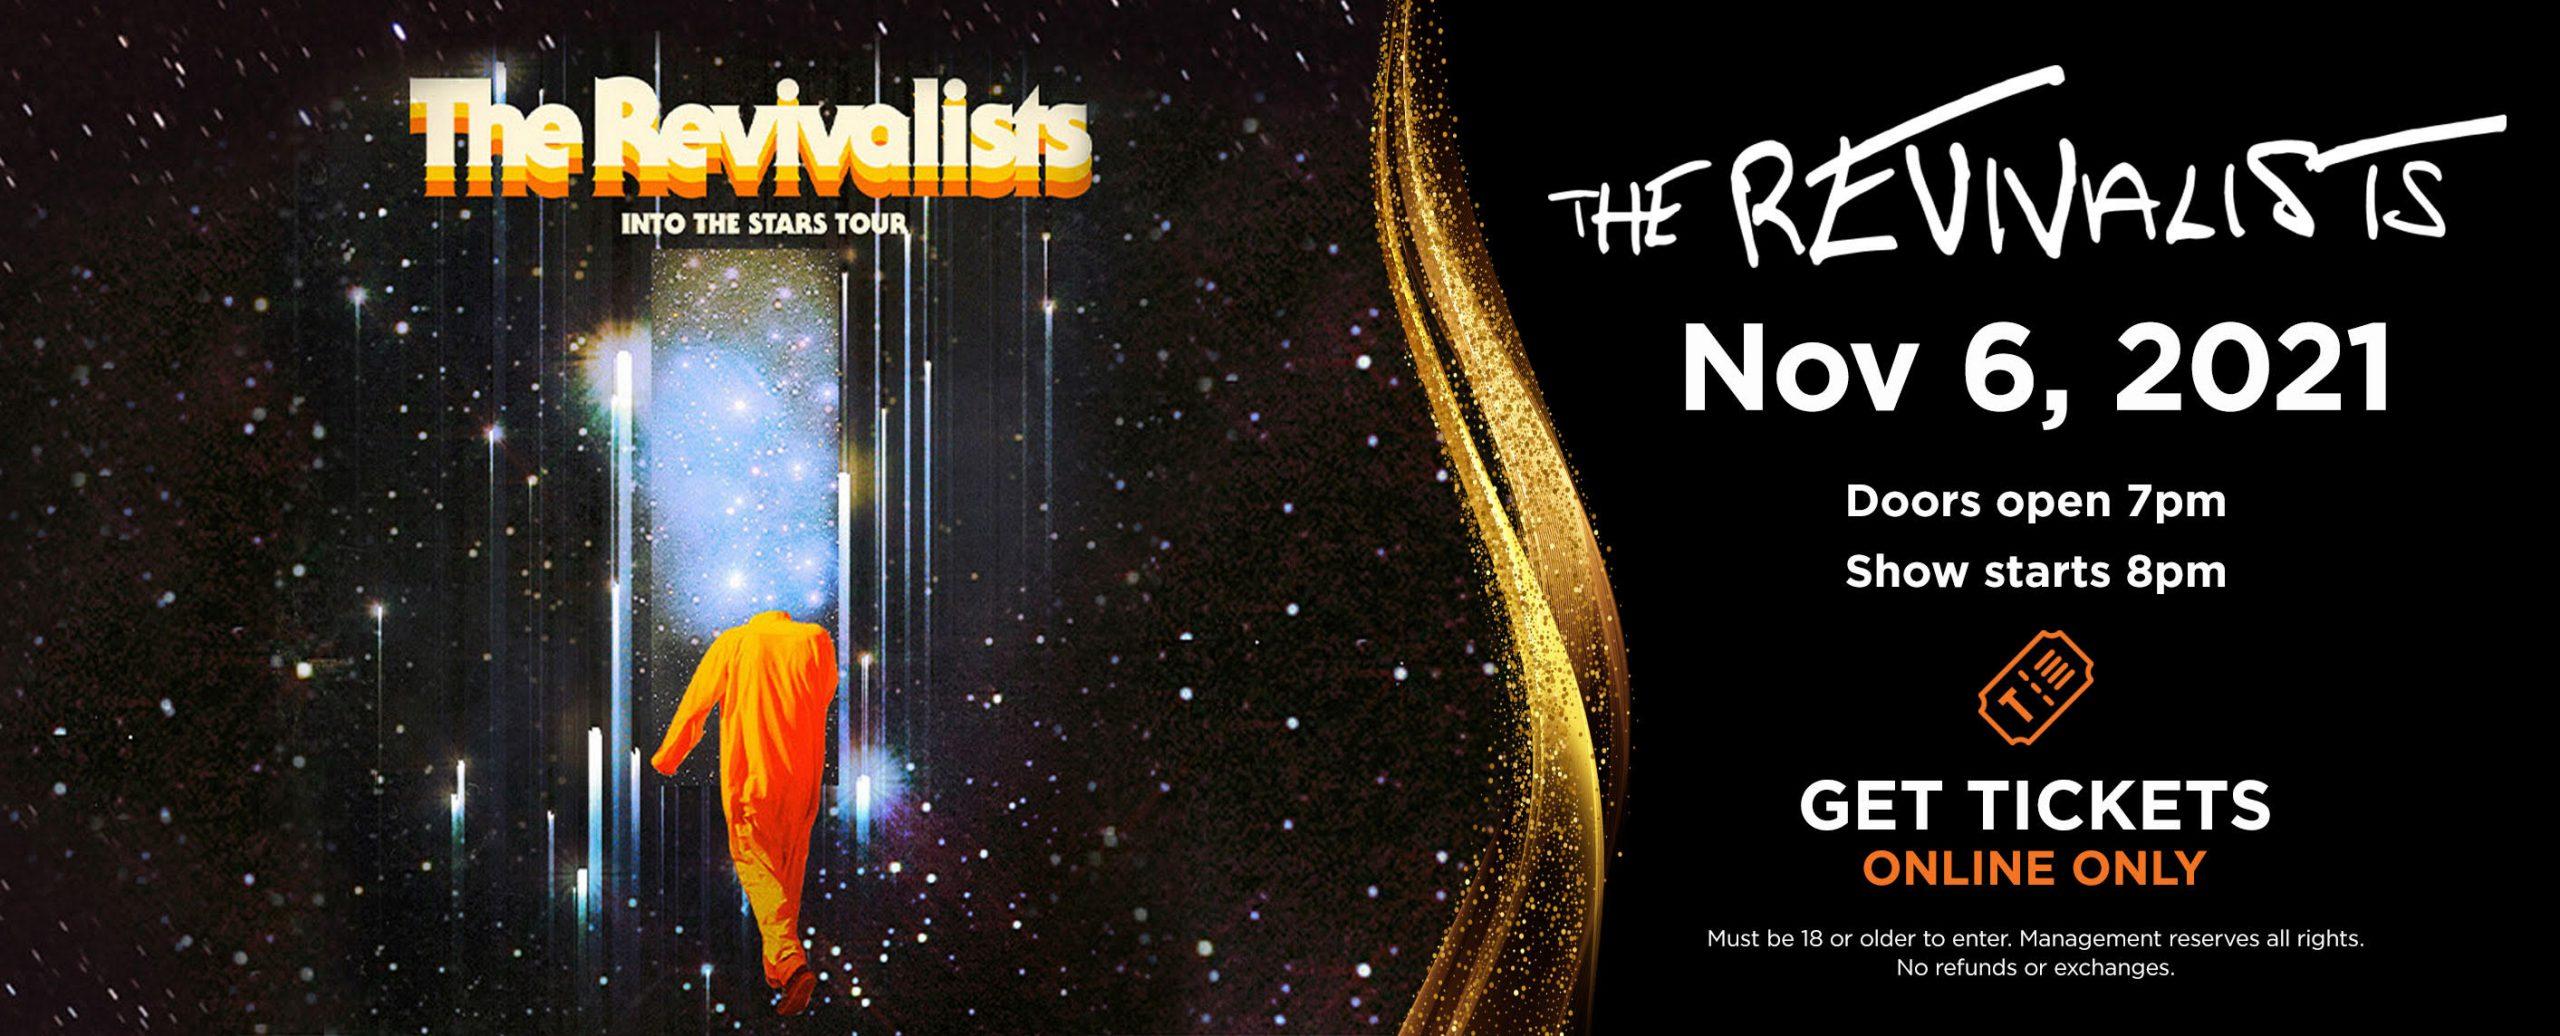 The Revivalists - Nov 6, 2021 | Doors open 7pm, Show starts 8pm